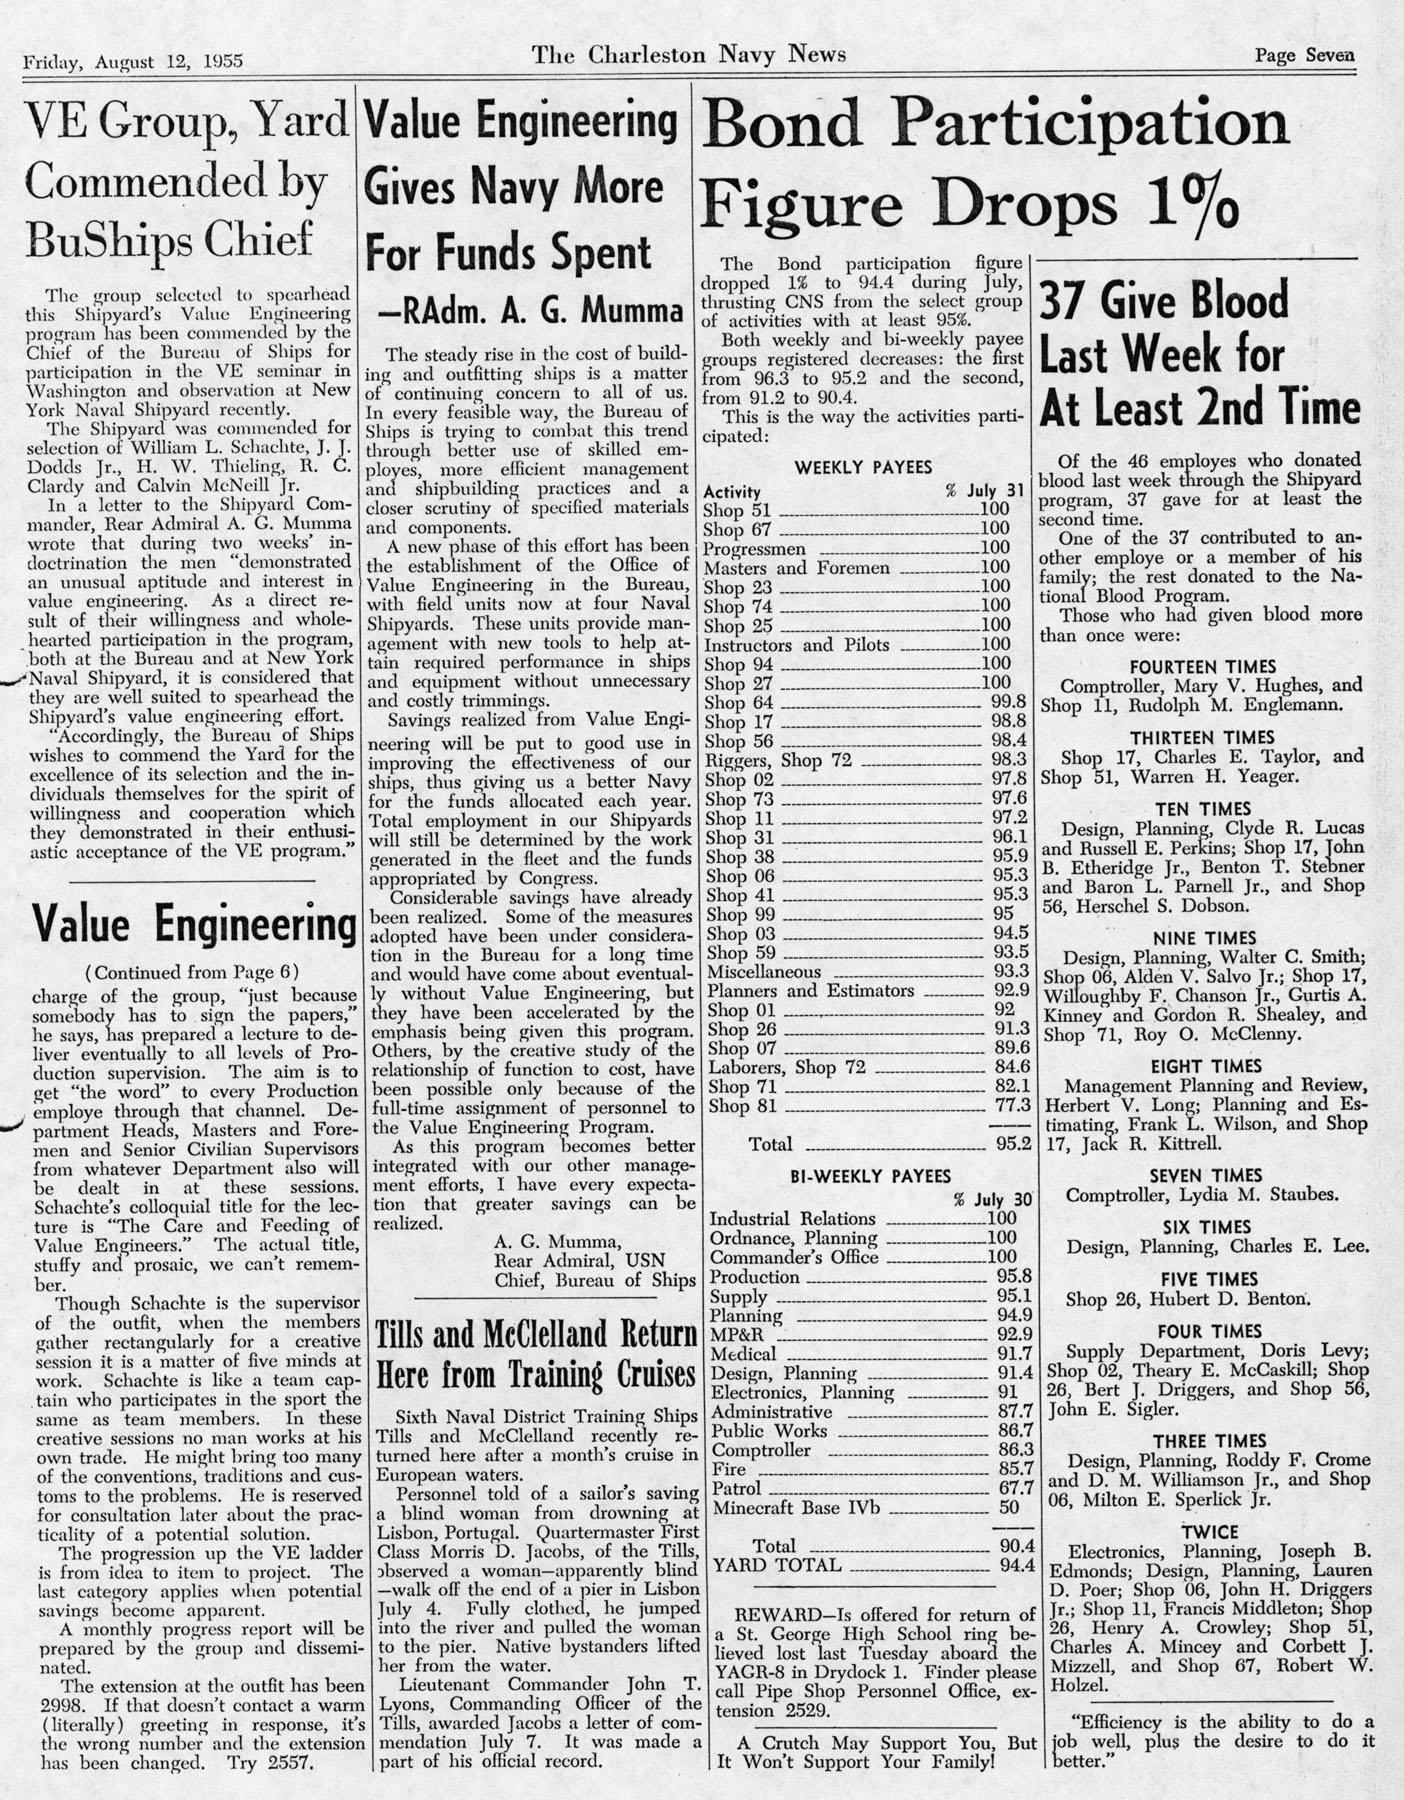 The Charleston Navy News, Volume 14, Edition 2, page vii